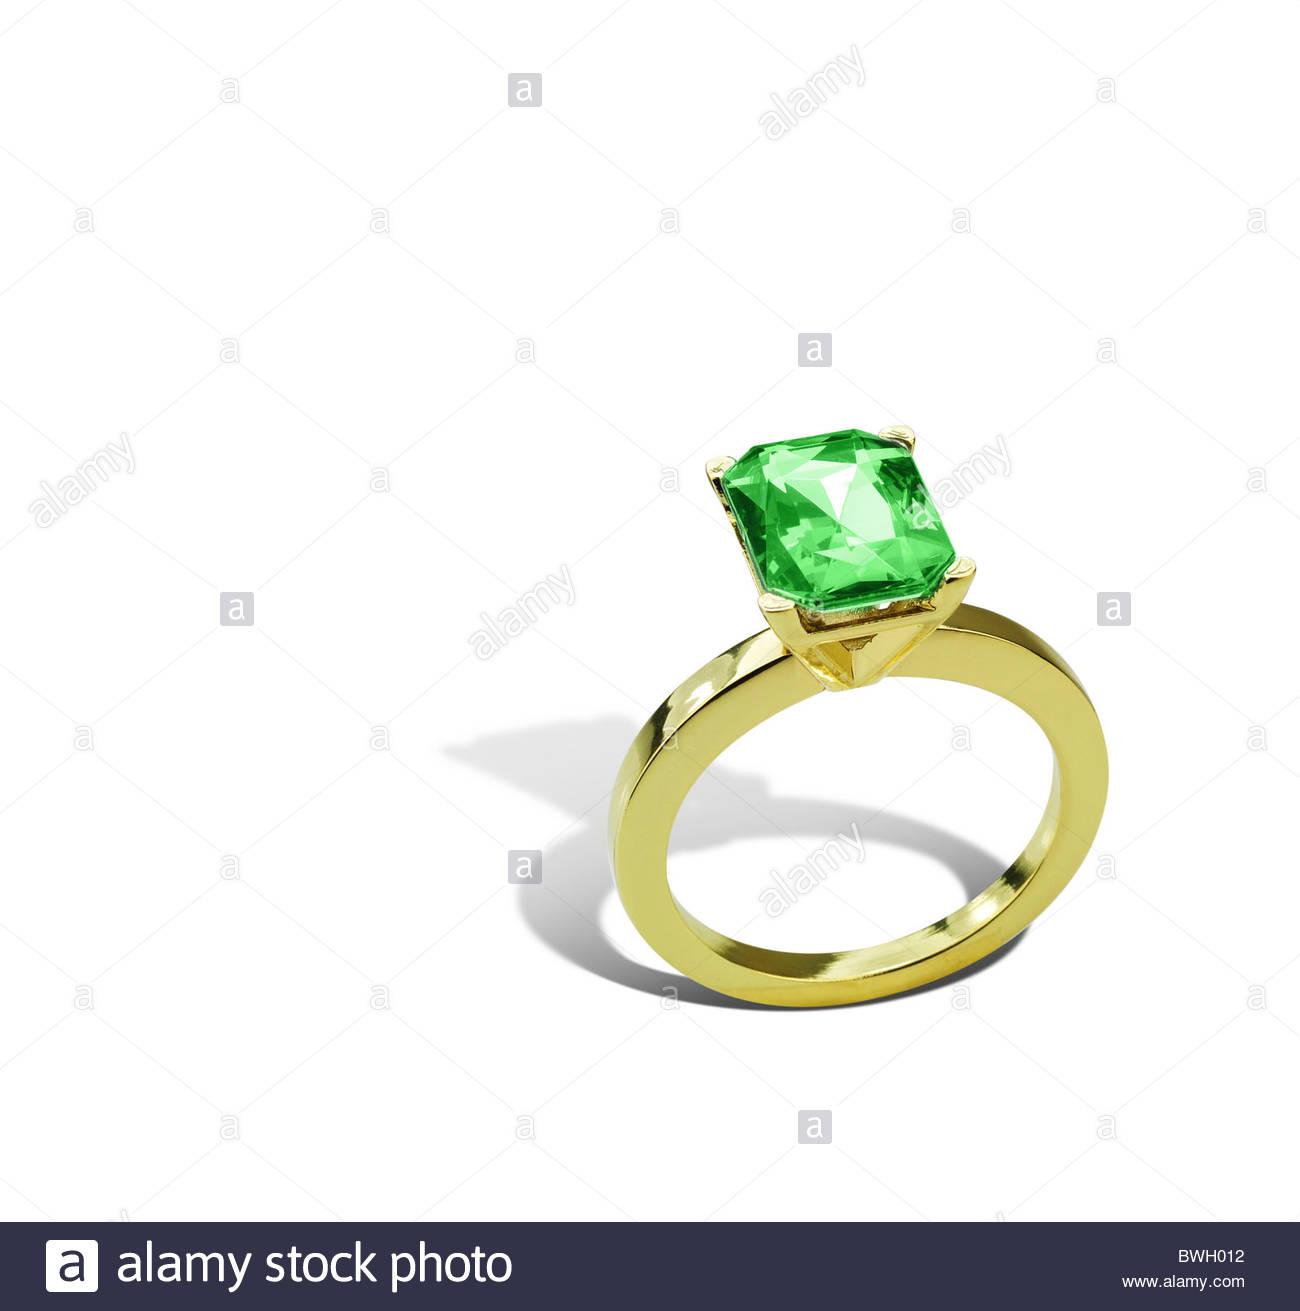 Emerald ring - Stock Image